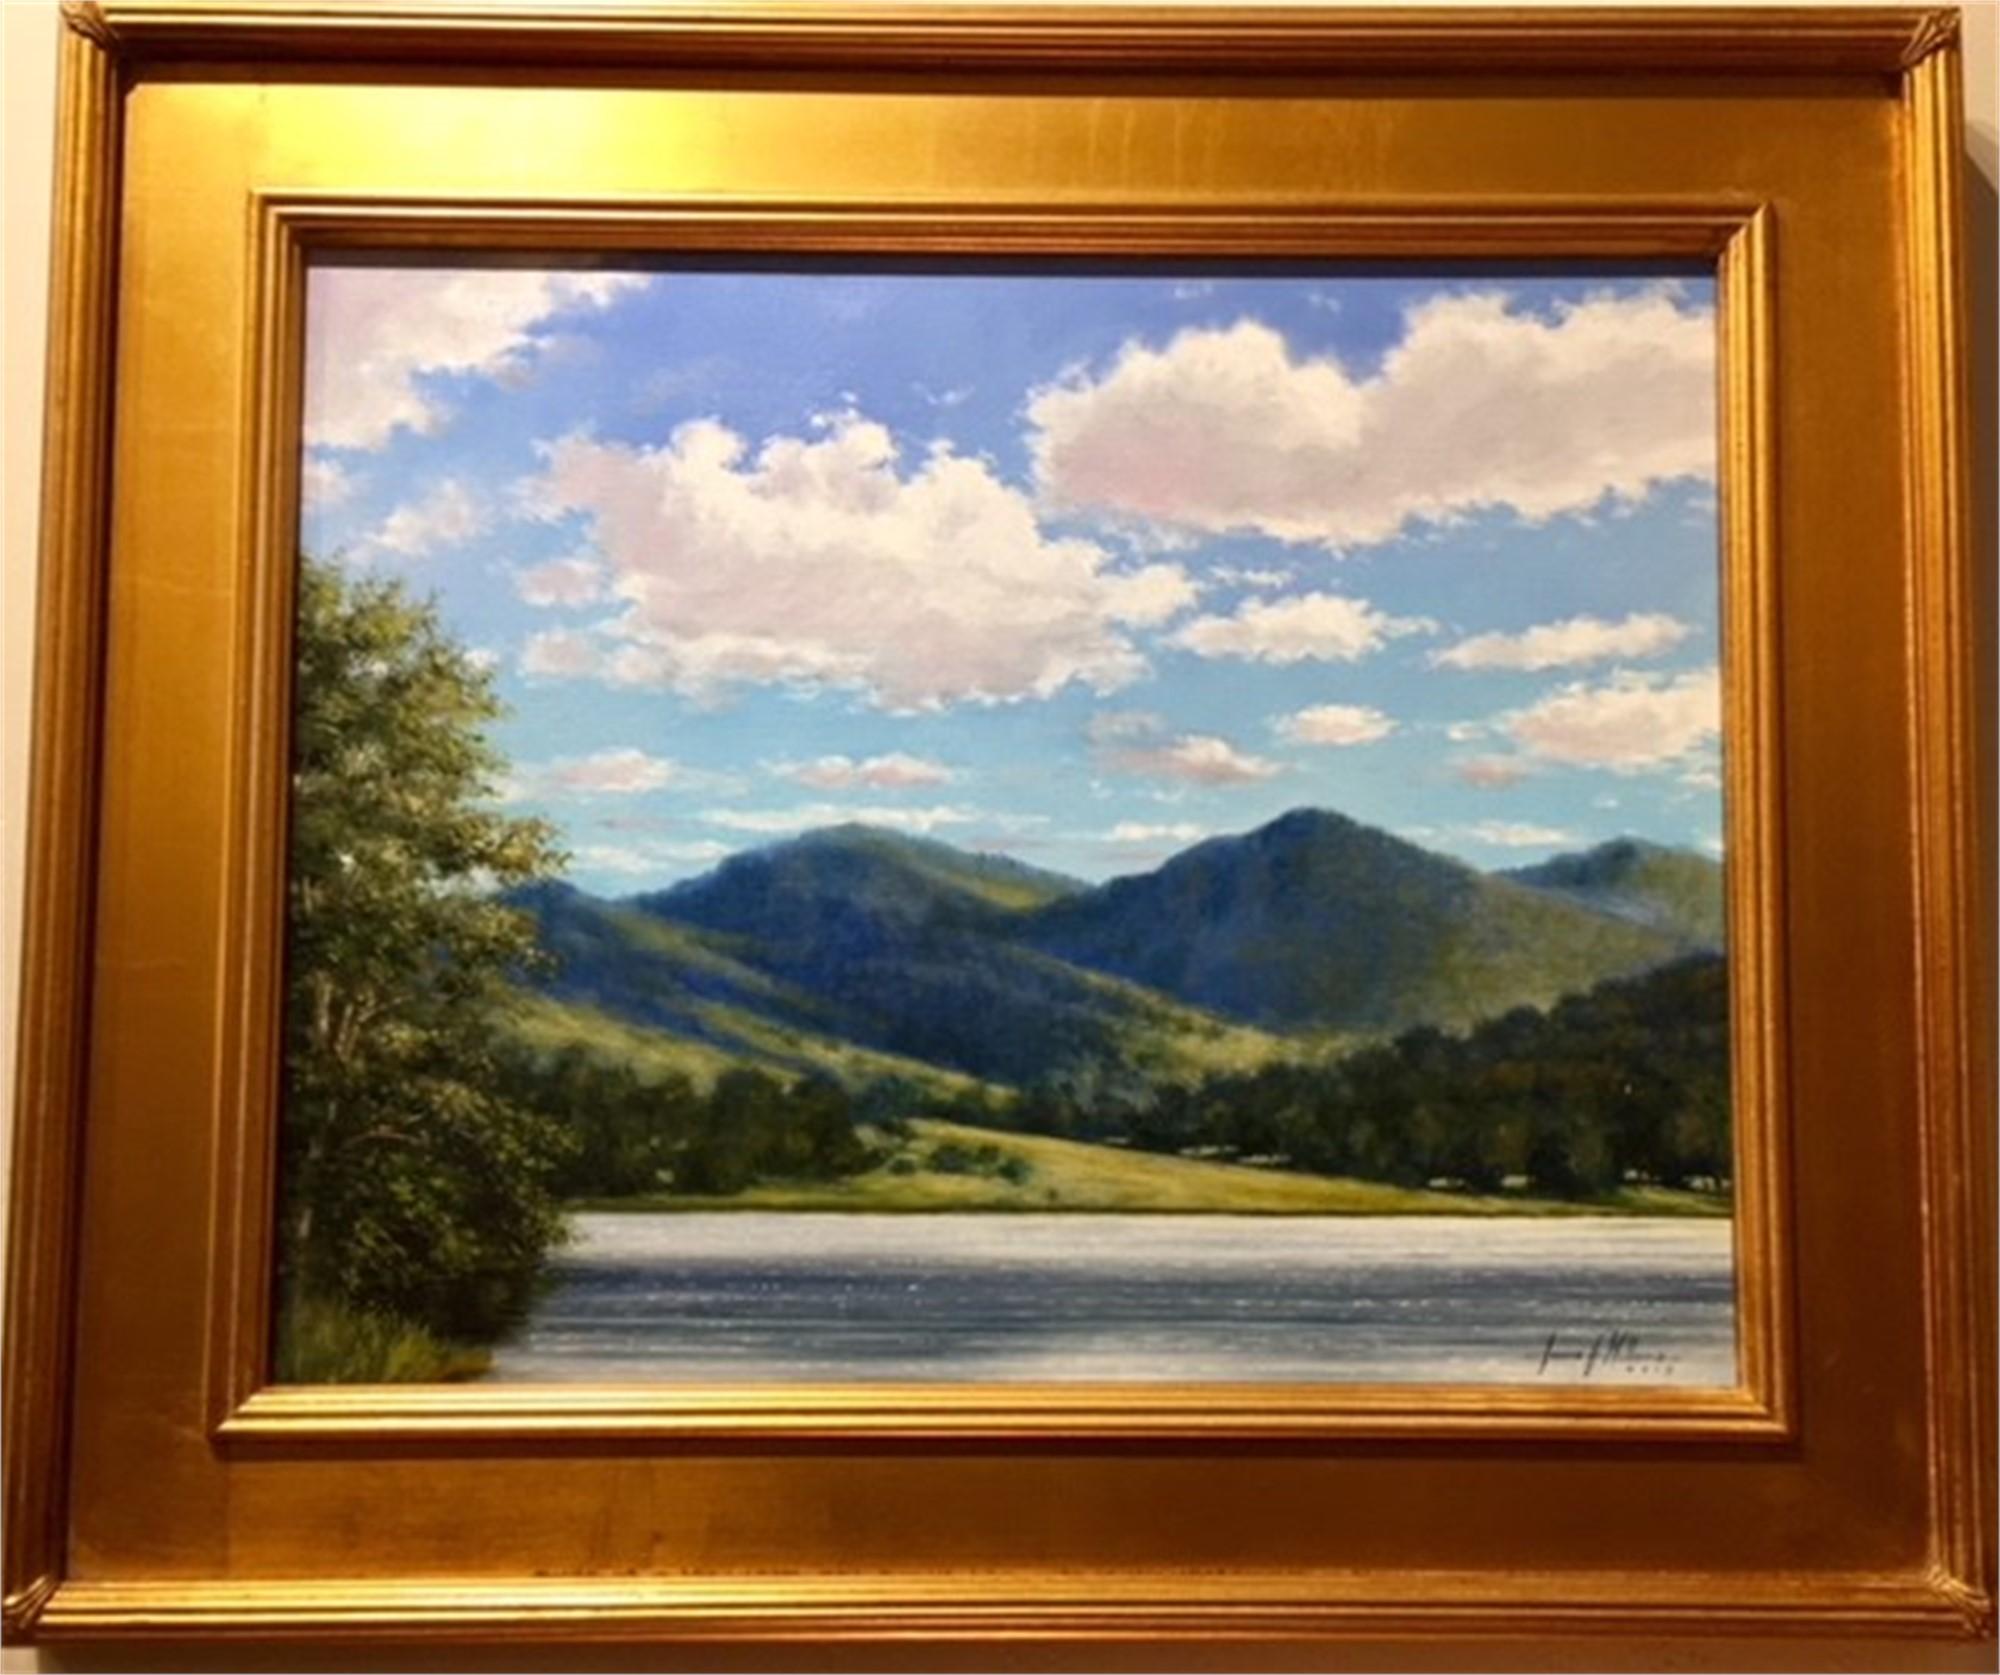 Mountain Lake by James J. Williams